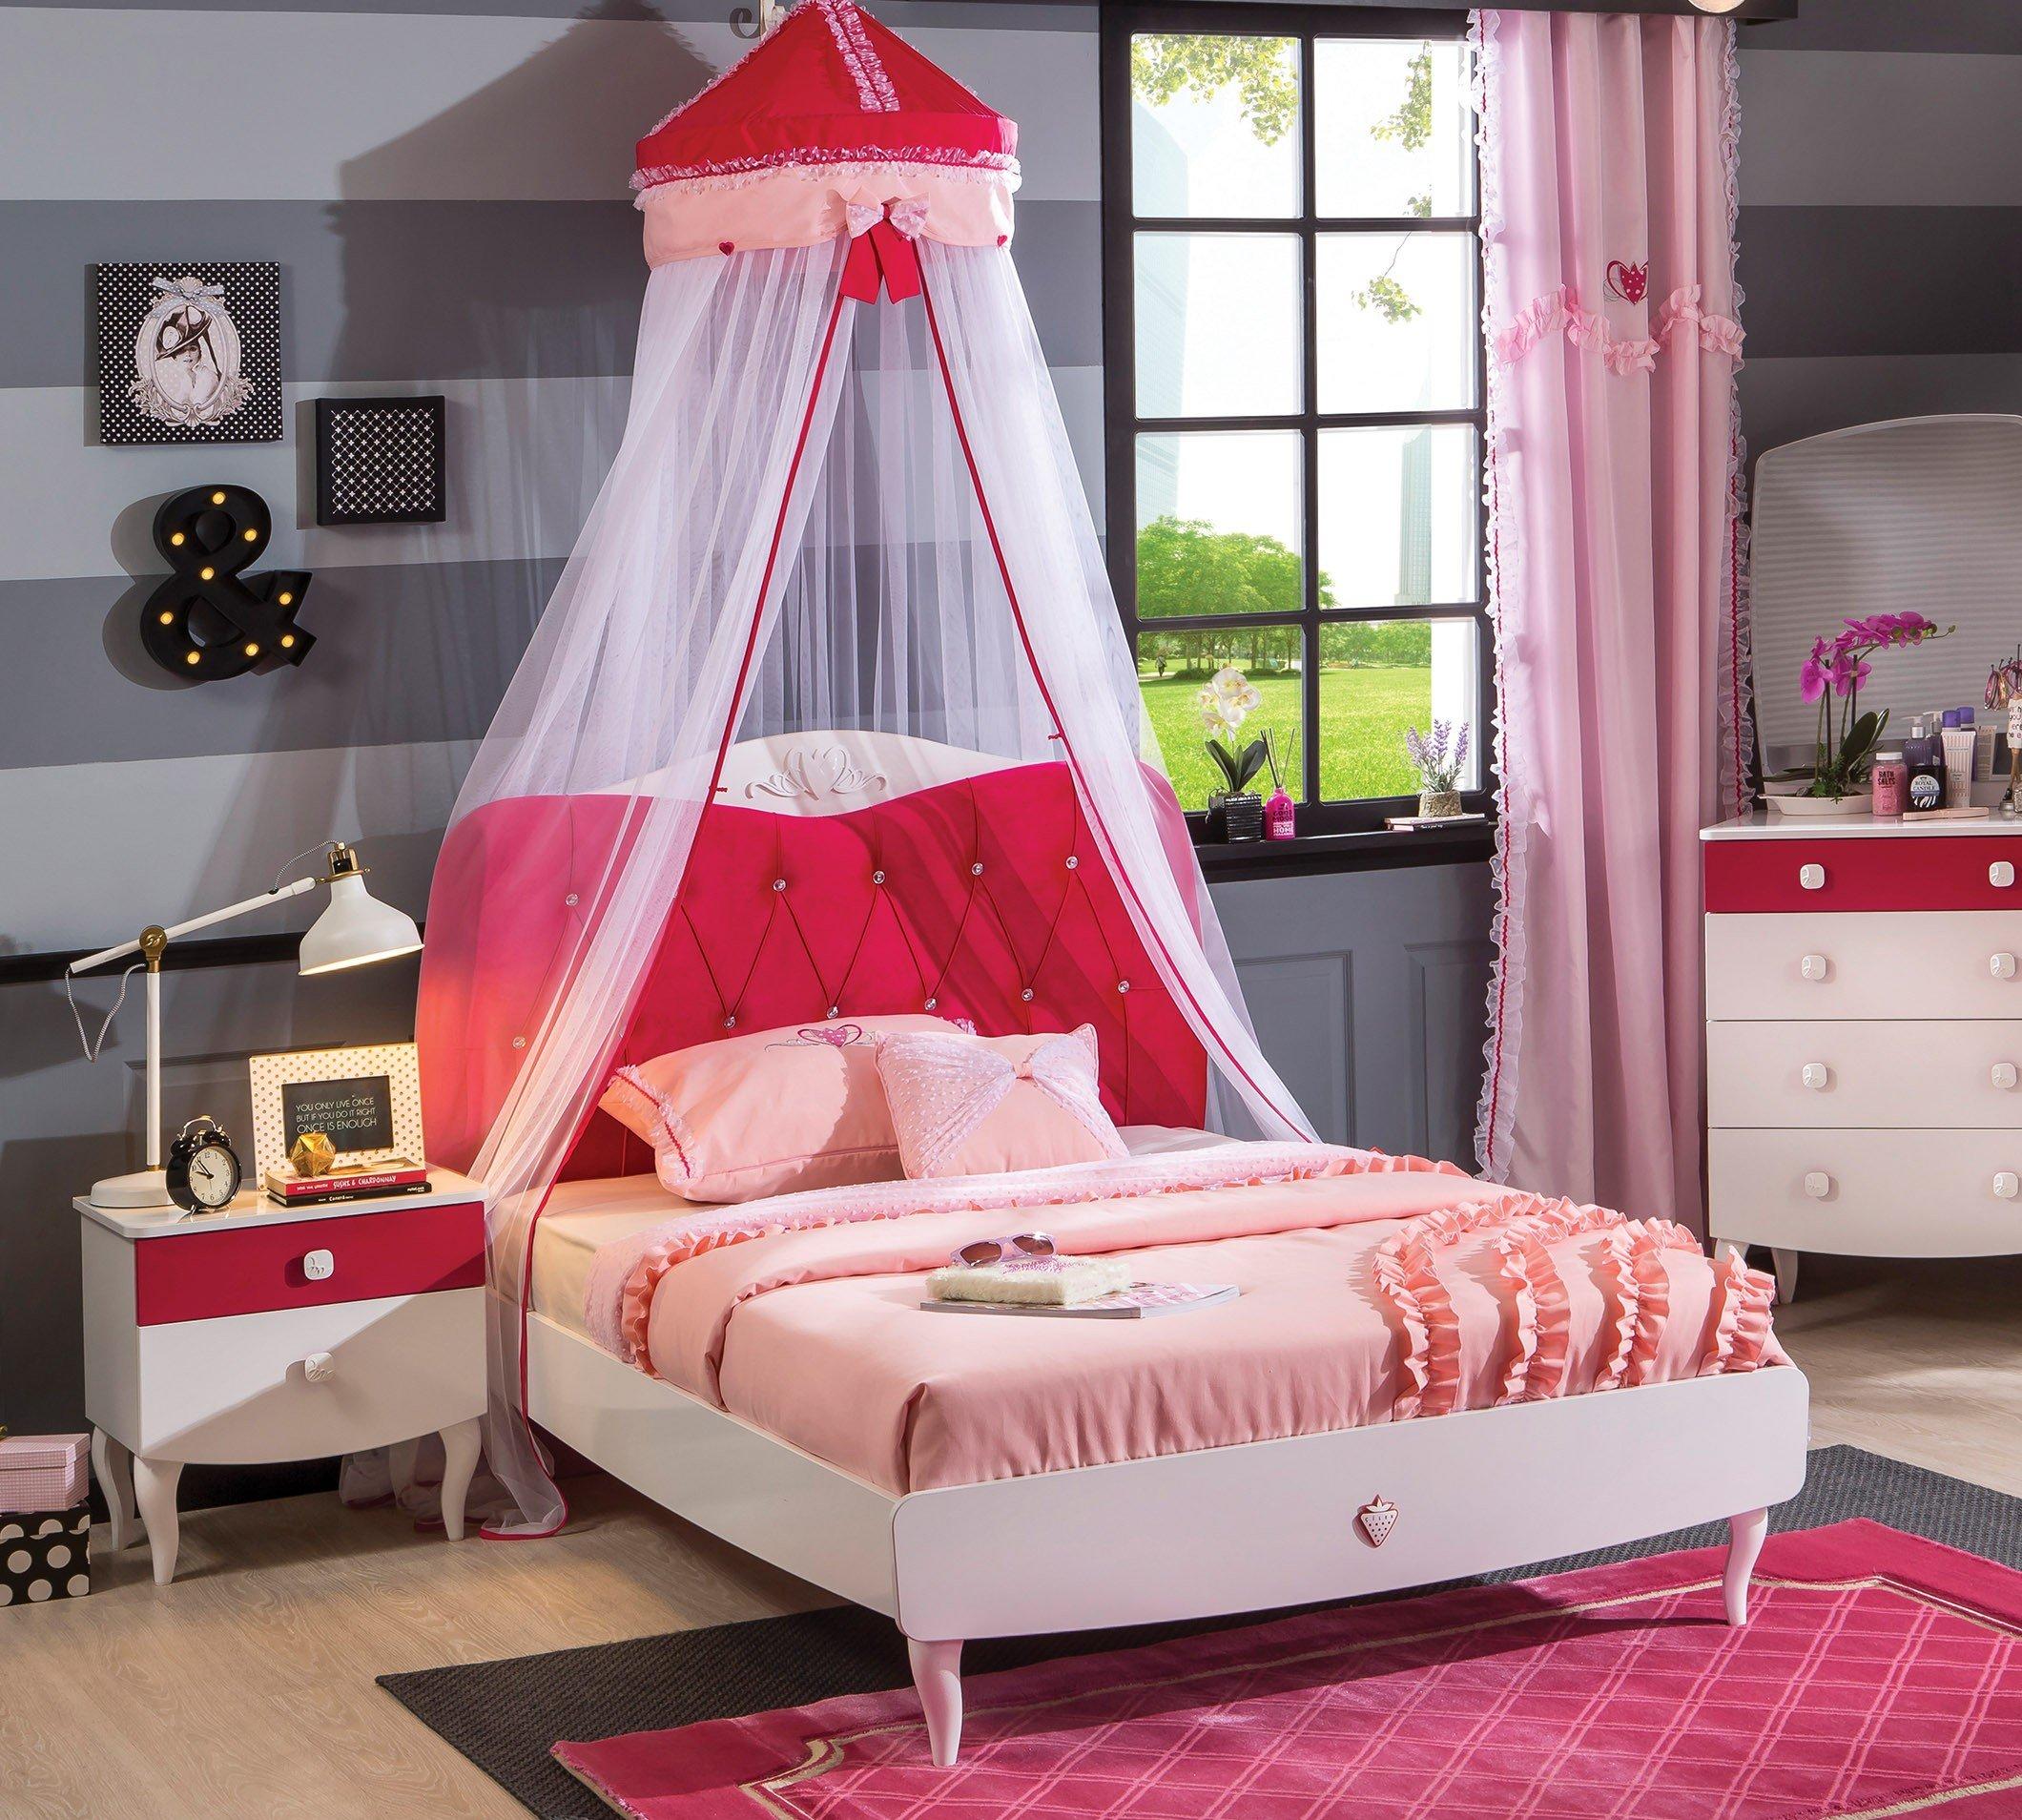 cilek yakut 120er bett extra breites sch nes jugendbett. Black Bedroom Furniture Sets. Home Design Ideas